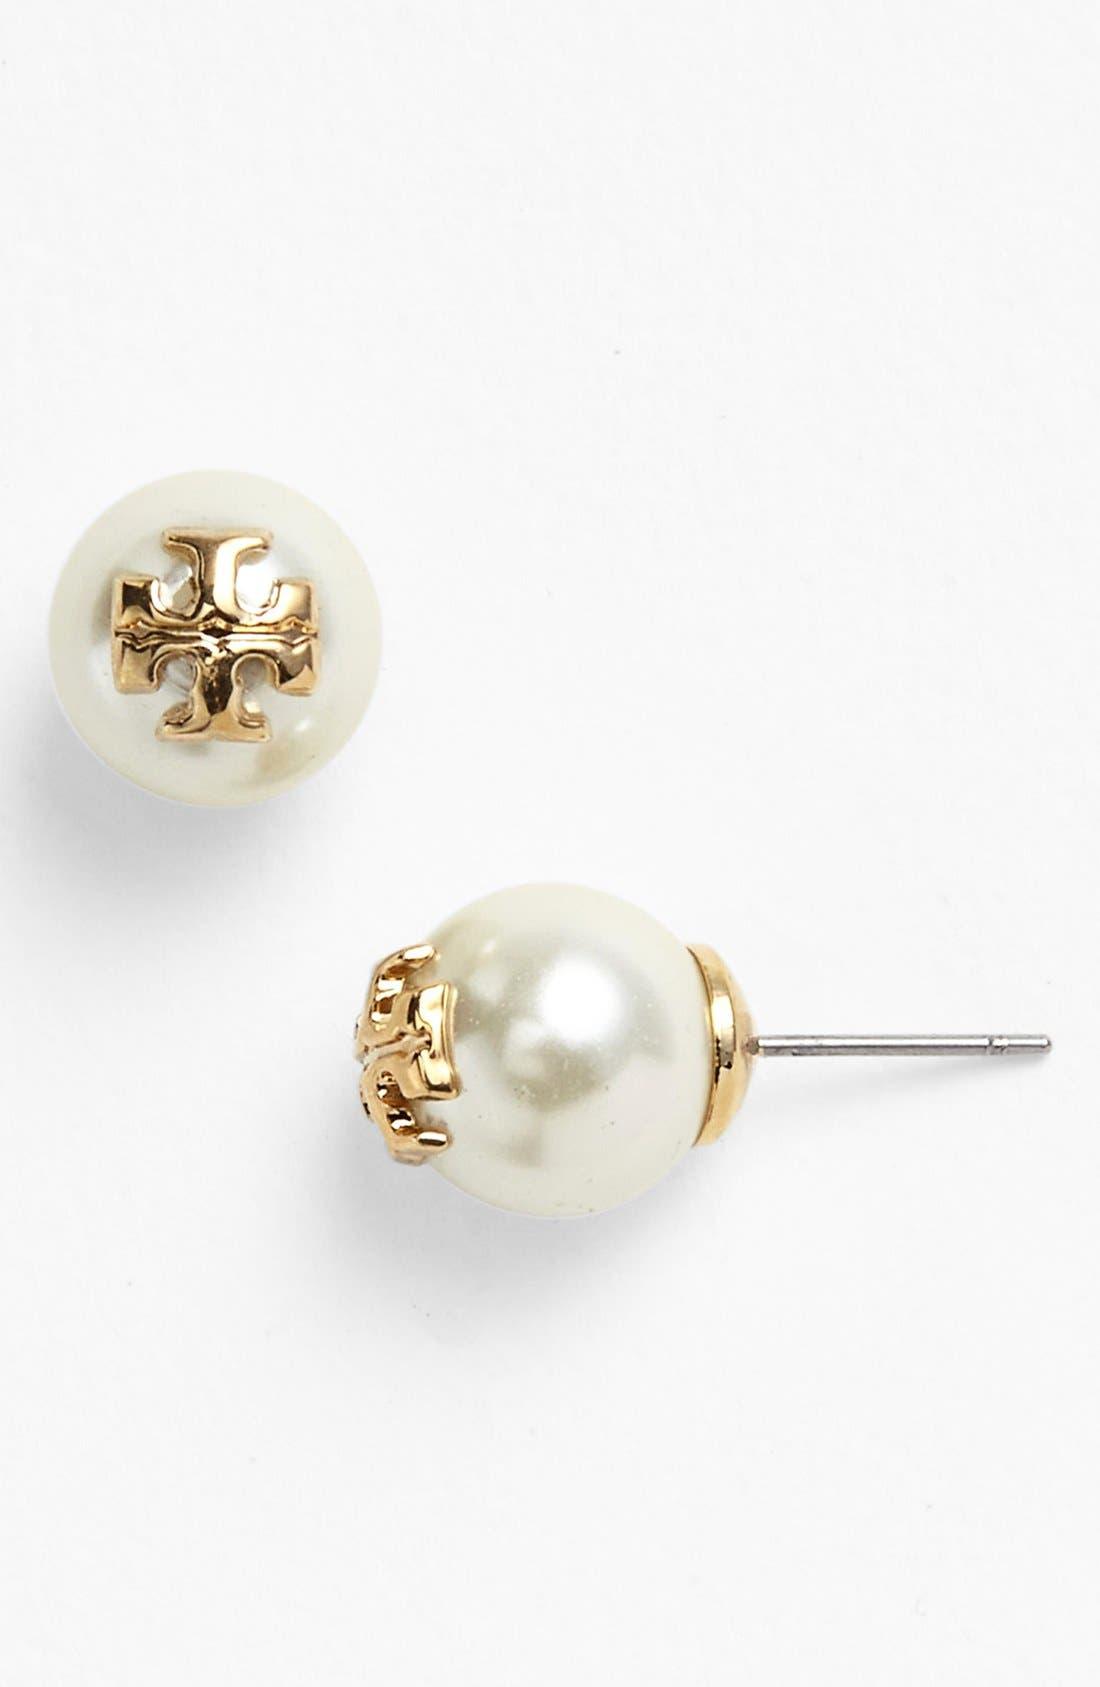 Tory Burch Swarovski Imitation Pearl Stud Earrings ORkE0pB